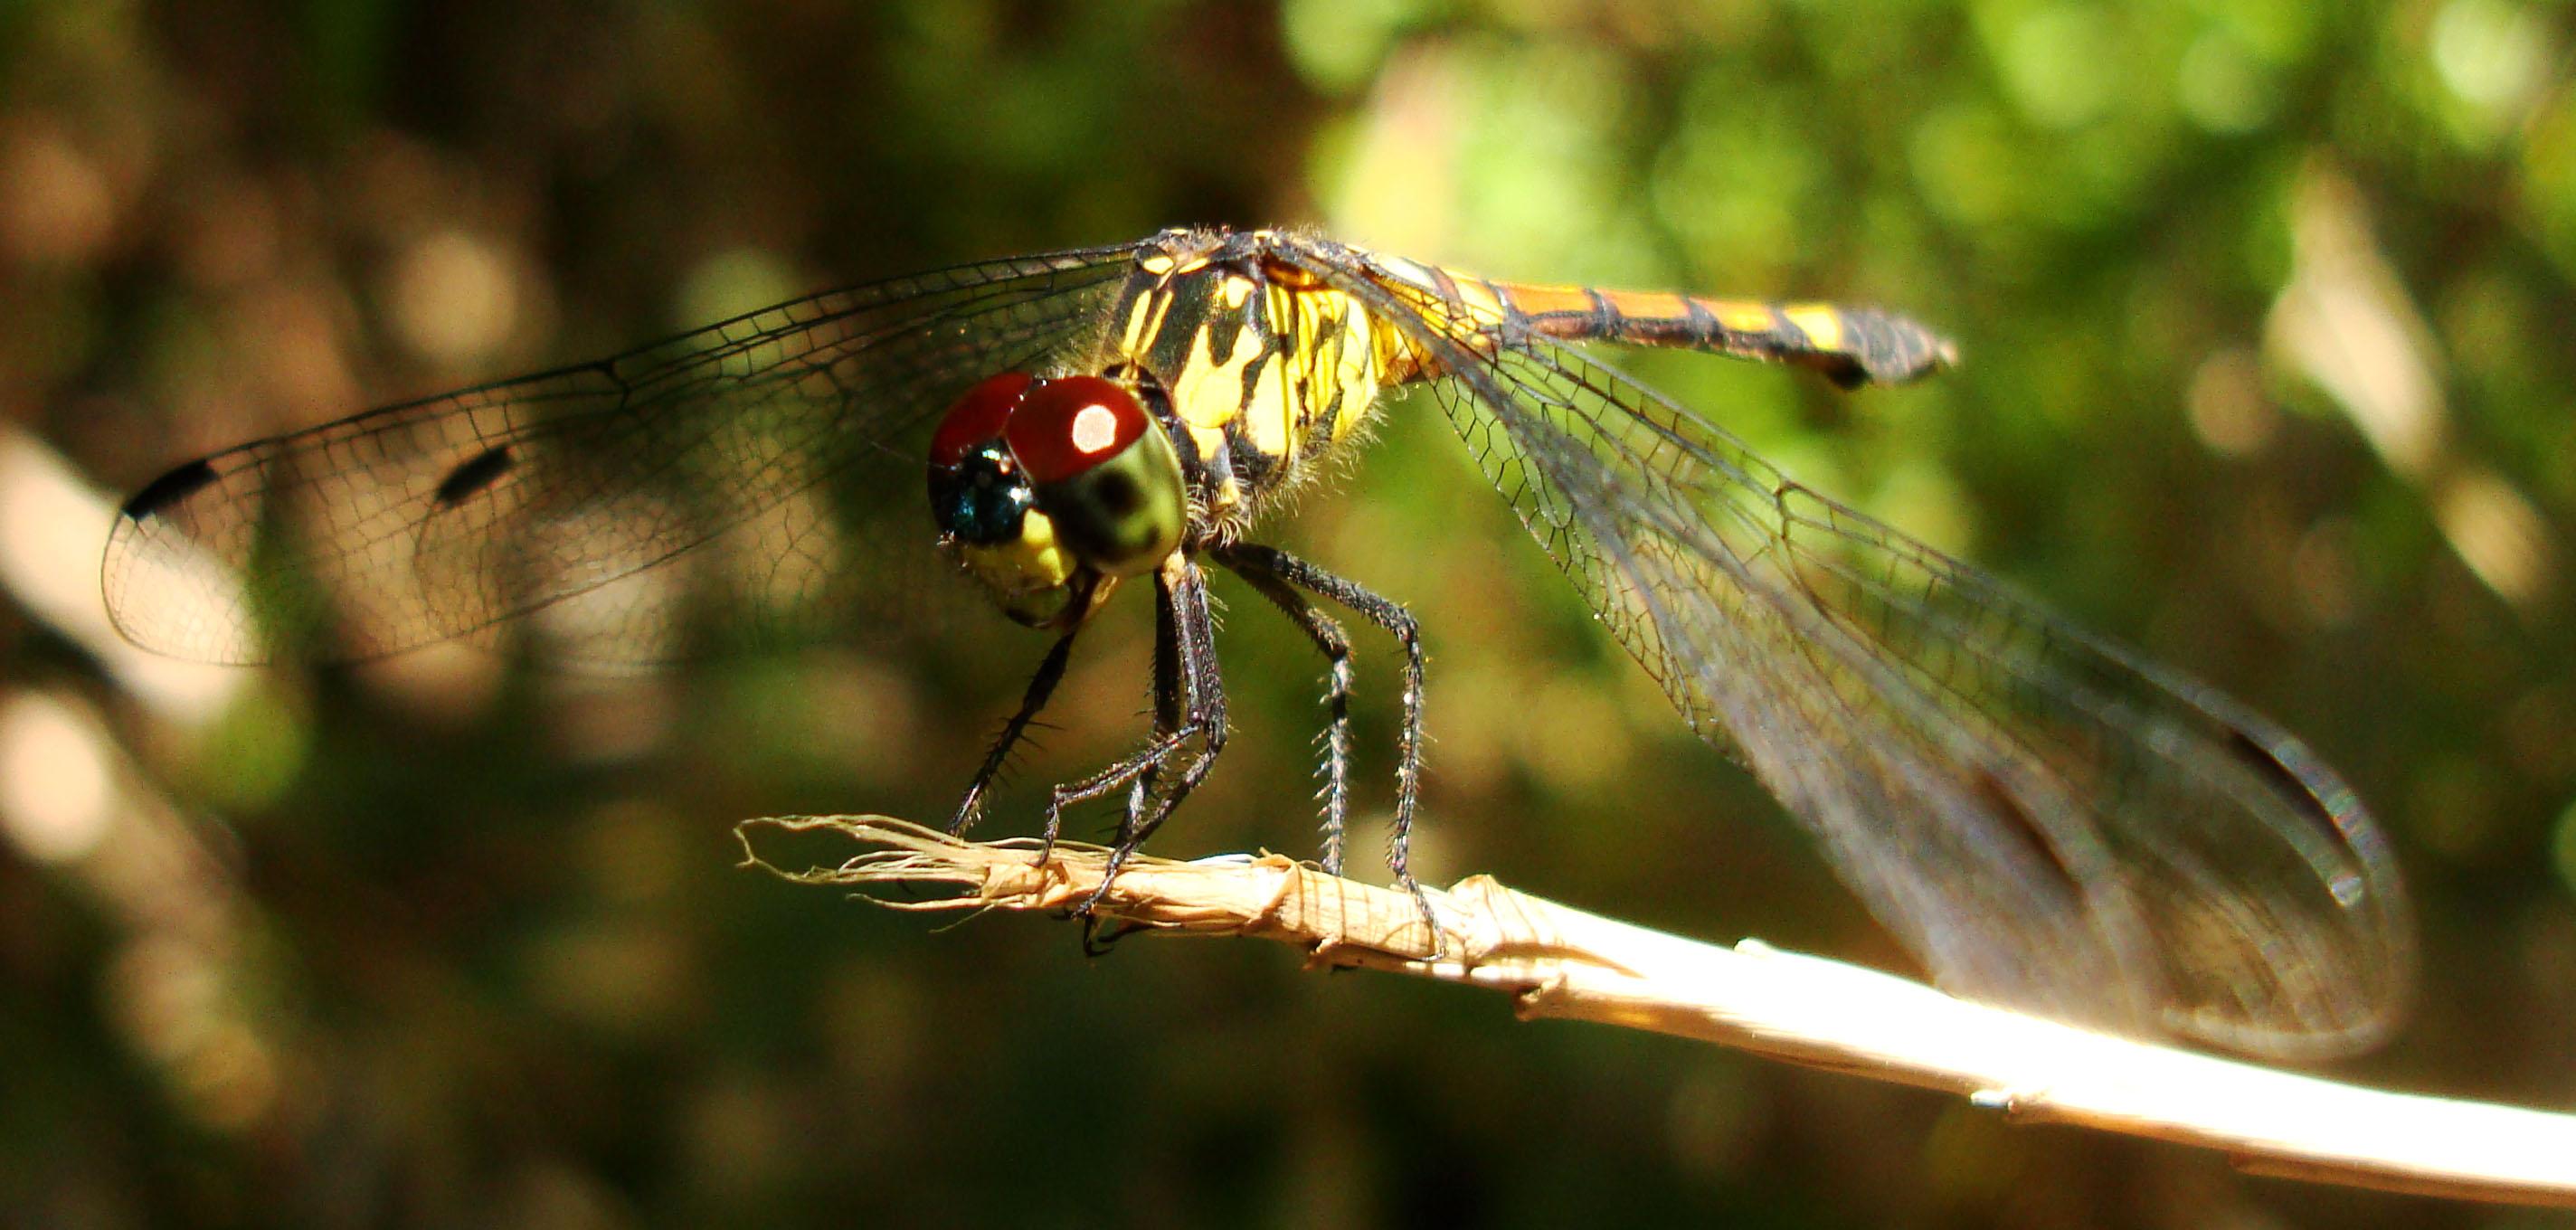 Libellulidae Red Swampdragon Agrionoptera insignis allogenes Sunshine Coast Qld Australia 123